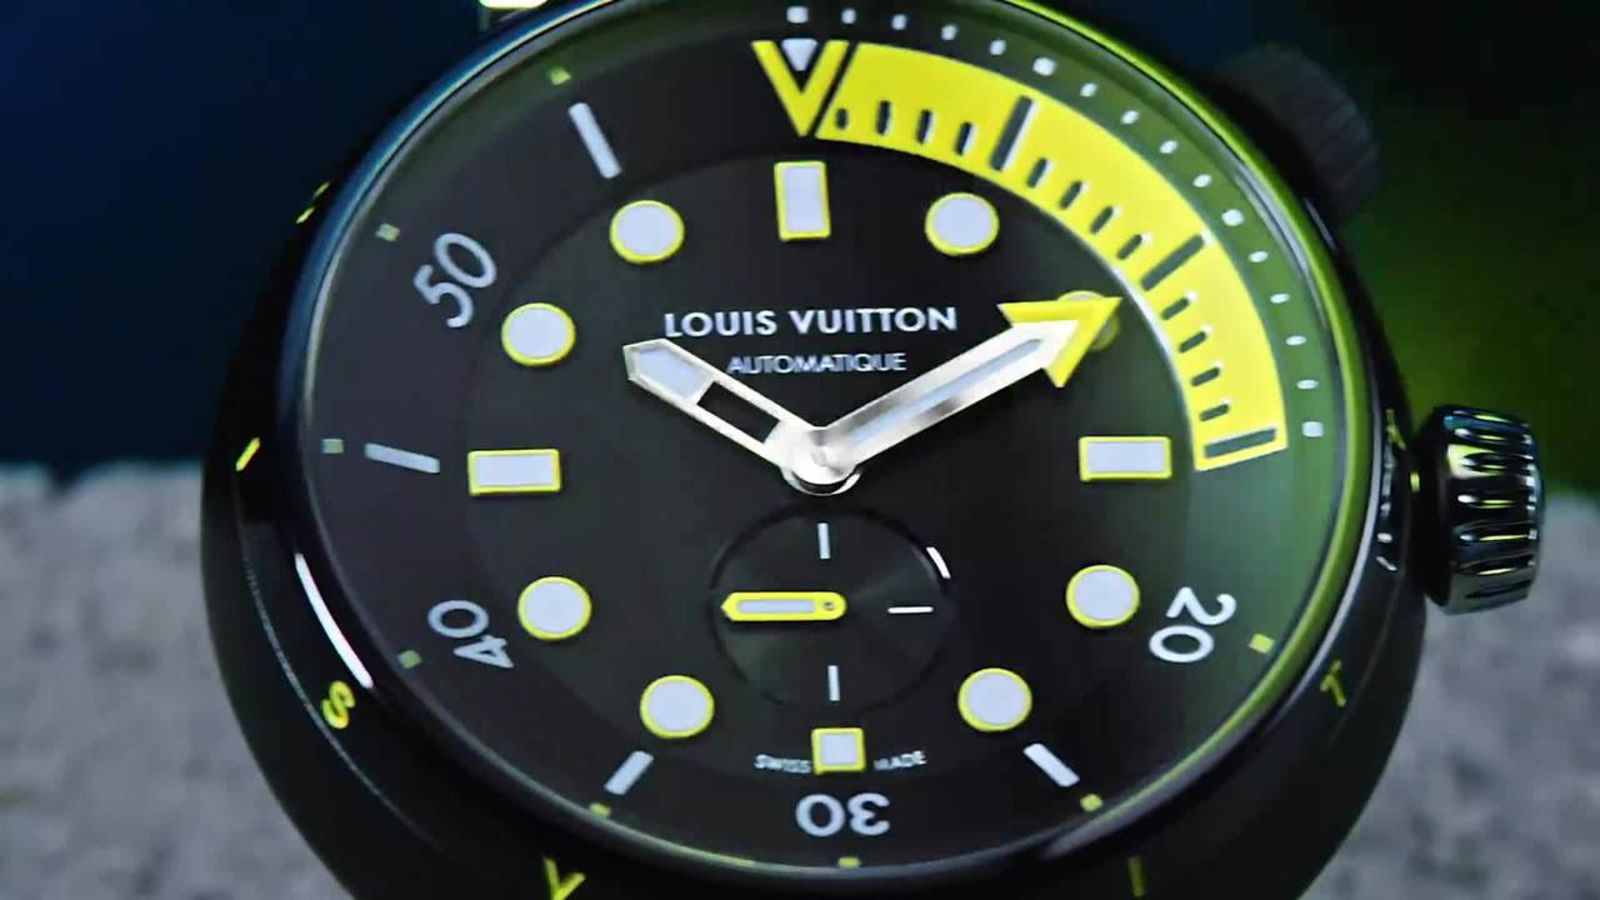 Nuovo orologio Louis Vuitton